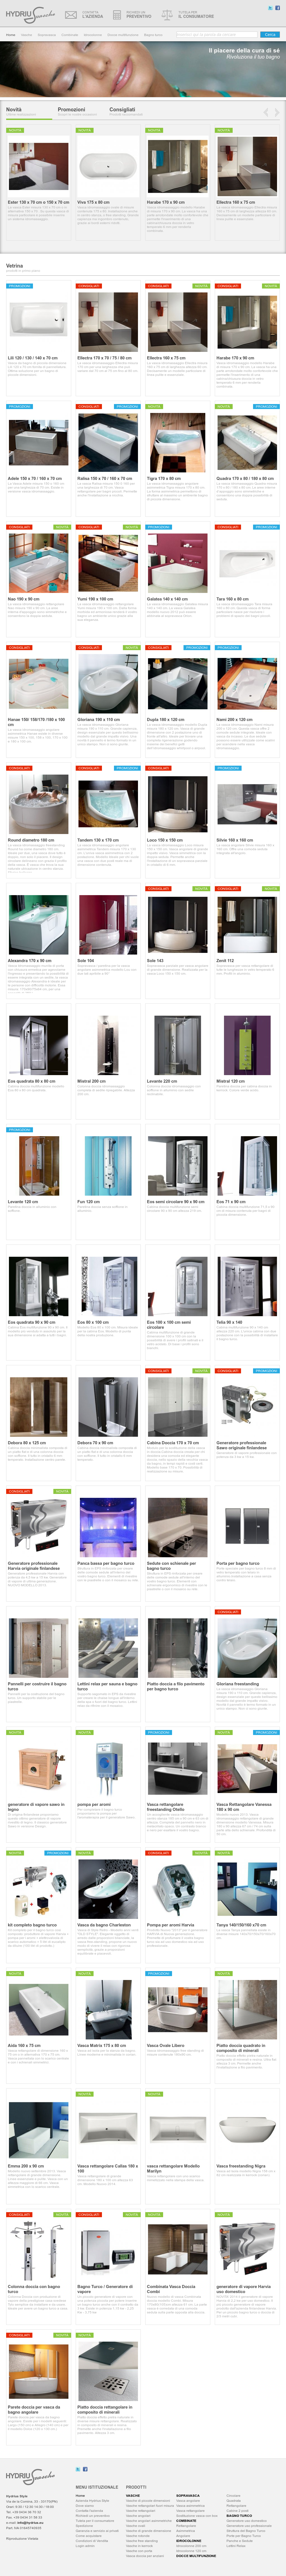 Casa Ideale Per 3 Persone hydrius vasche competitors, revenue and employees - owler